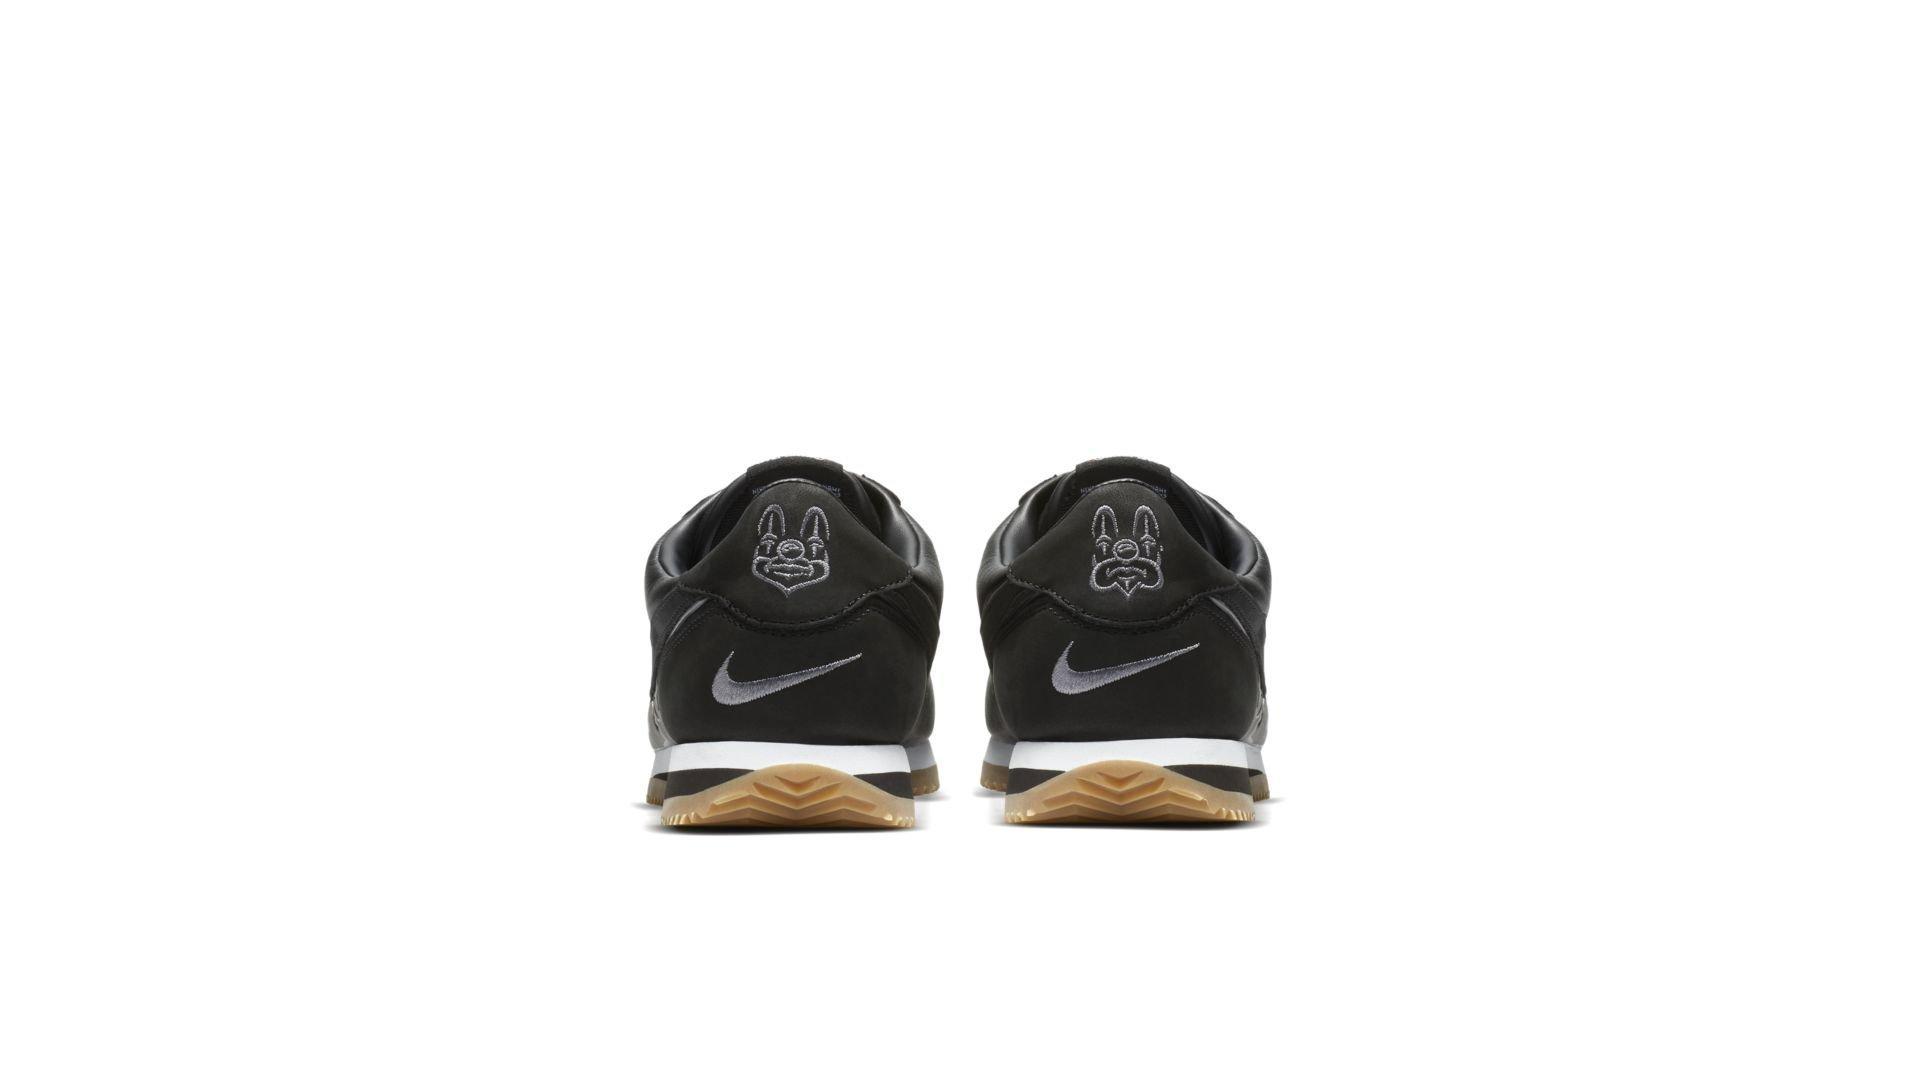 Nike Cortez Mister Cartoon Black (AA4875-001)